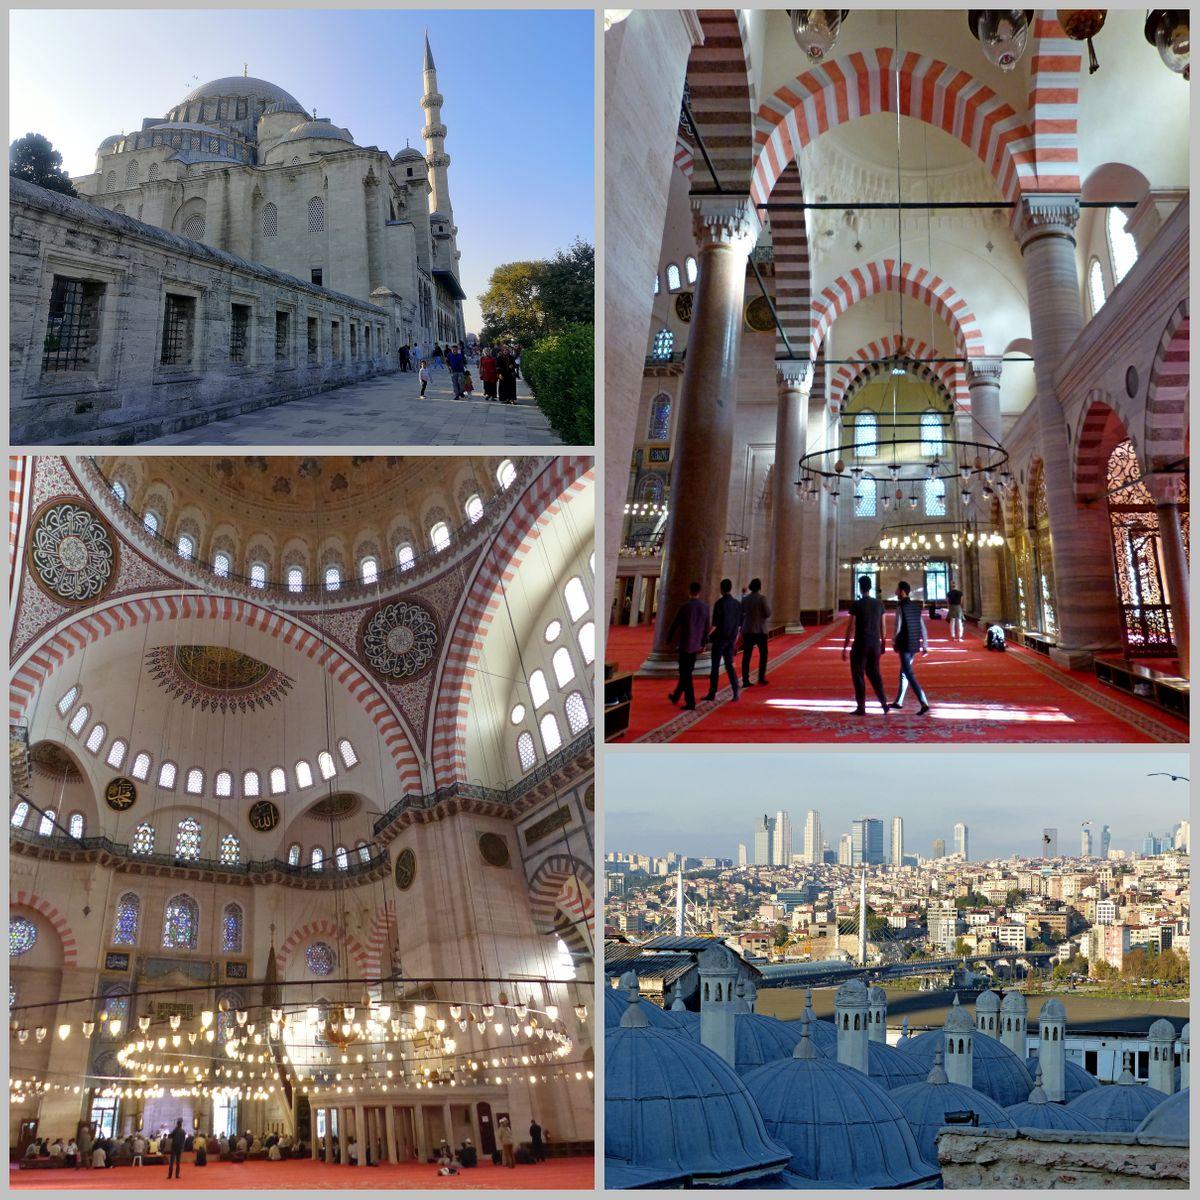 Sulejman-mecset